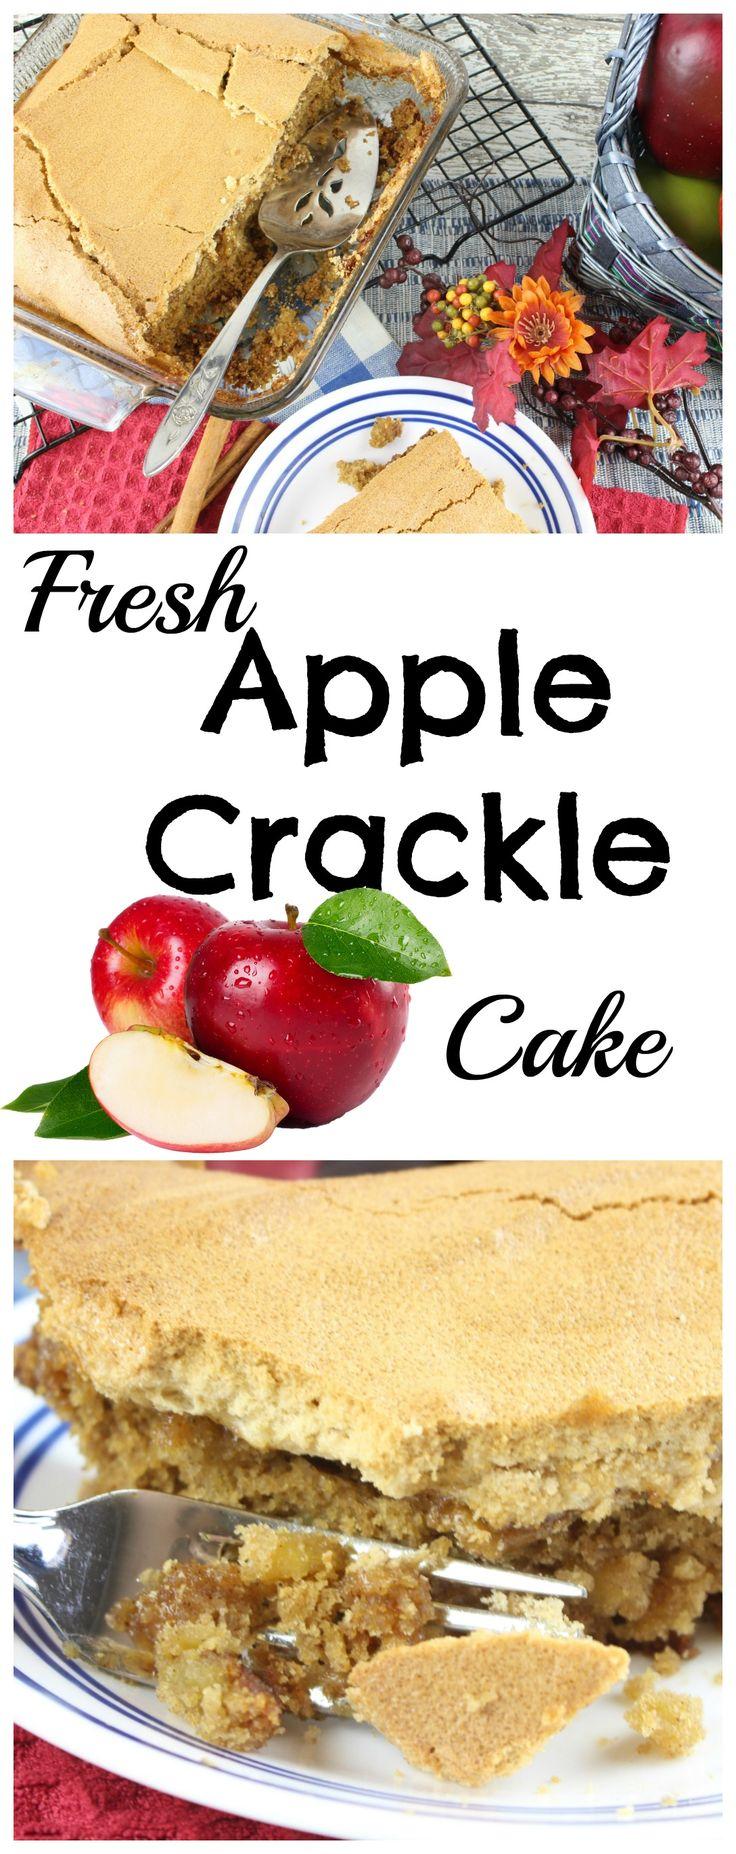 Fresh Apple Crackle Cake ~ https://www.southernplate.com